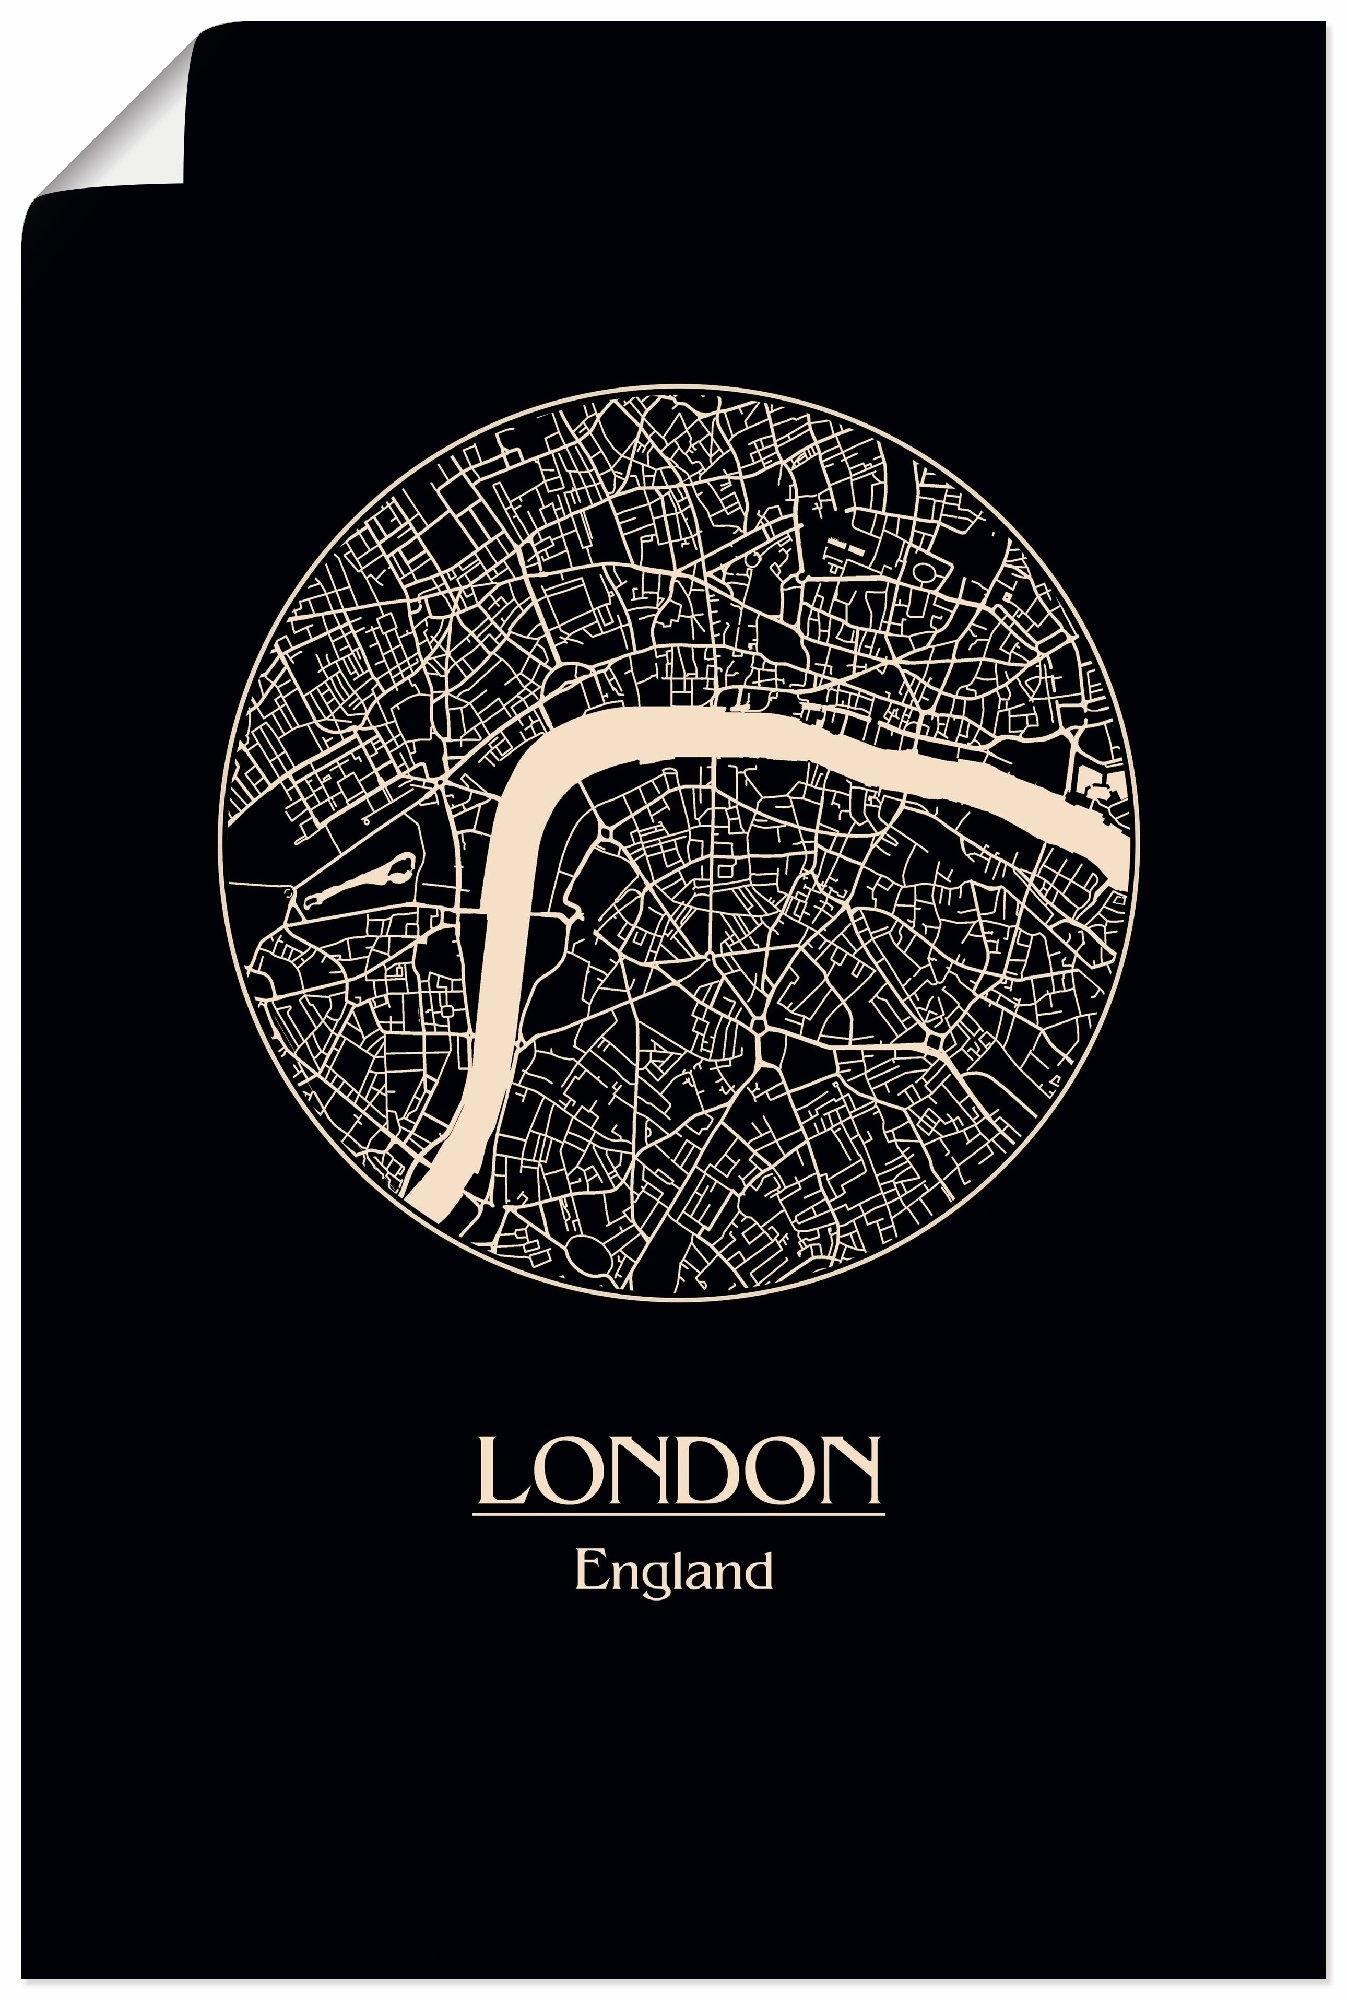 Artland artprint »Retro Karte London England Kreis« voordelig en veilig online kopen